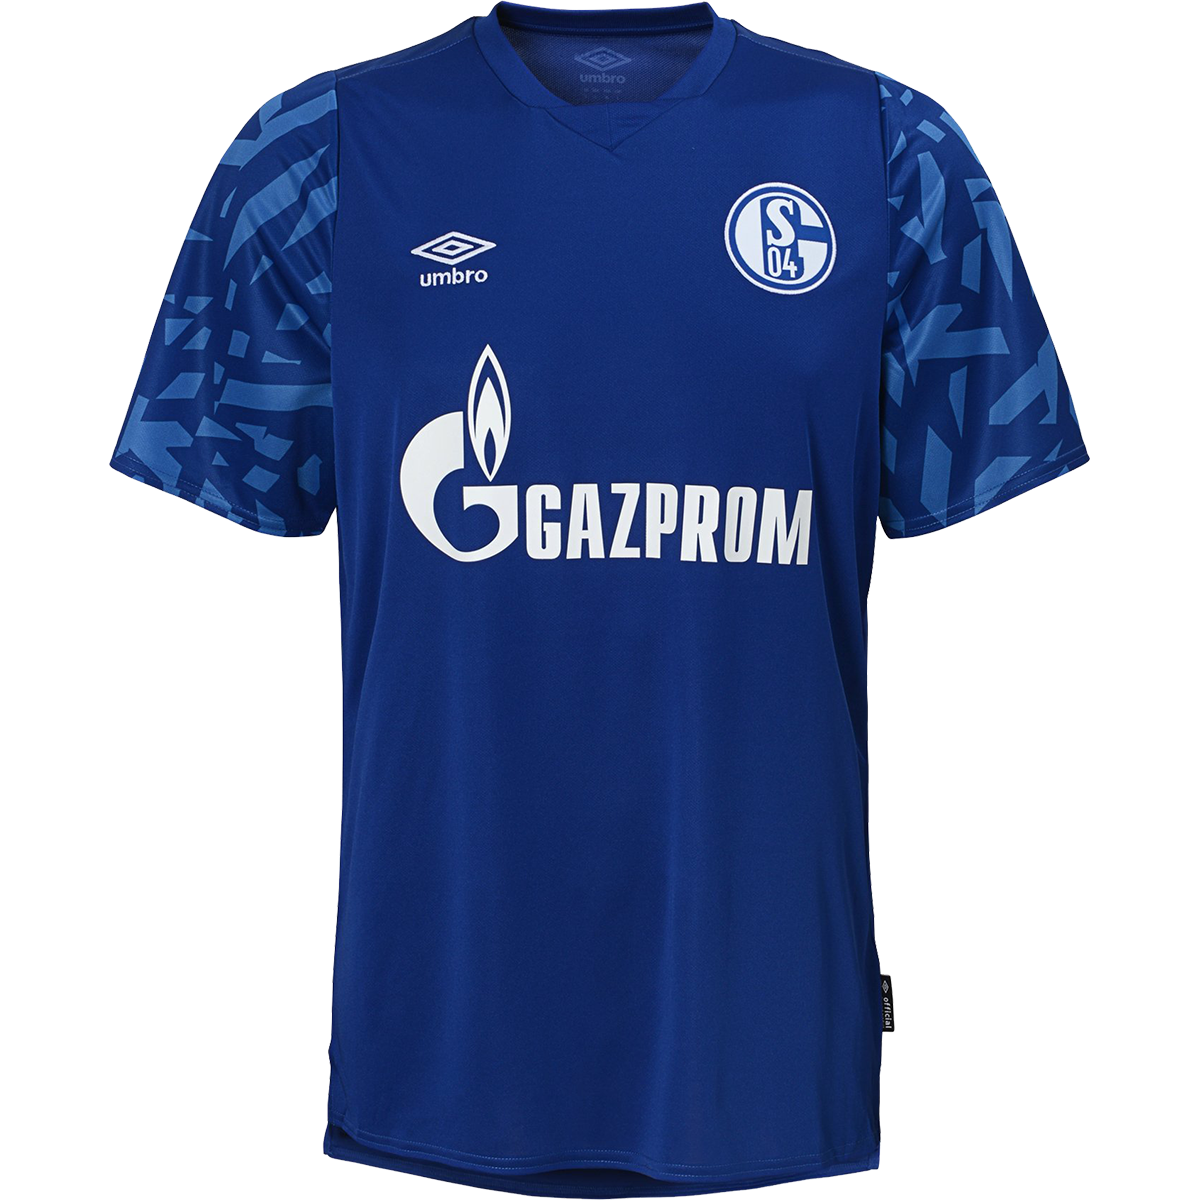 Umbro FC Schalke 04 Herren Auswärts Trikot 201920 weiß